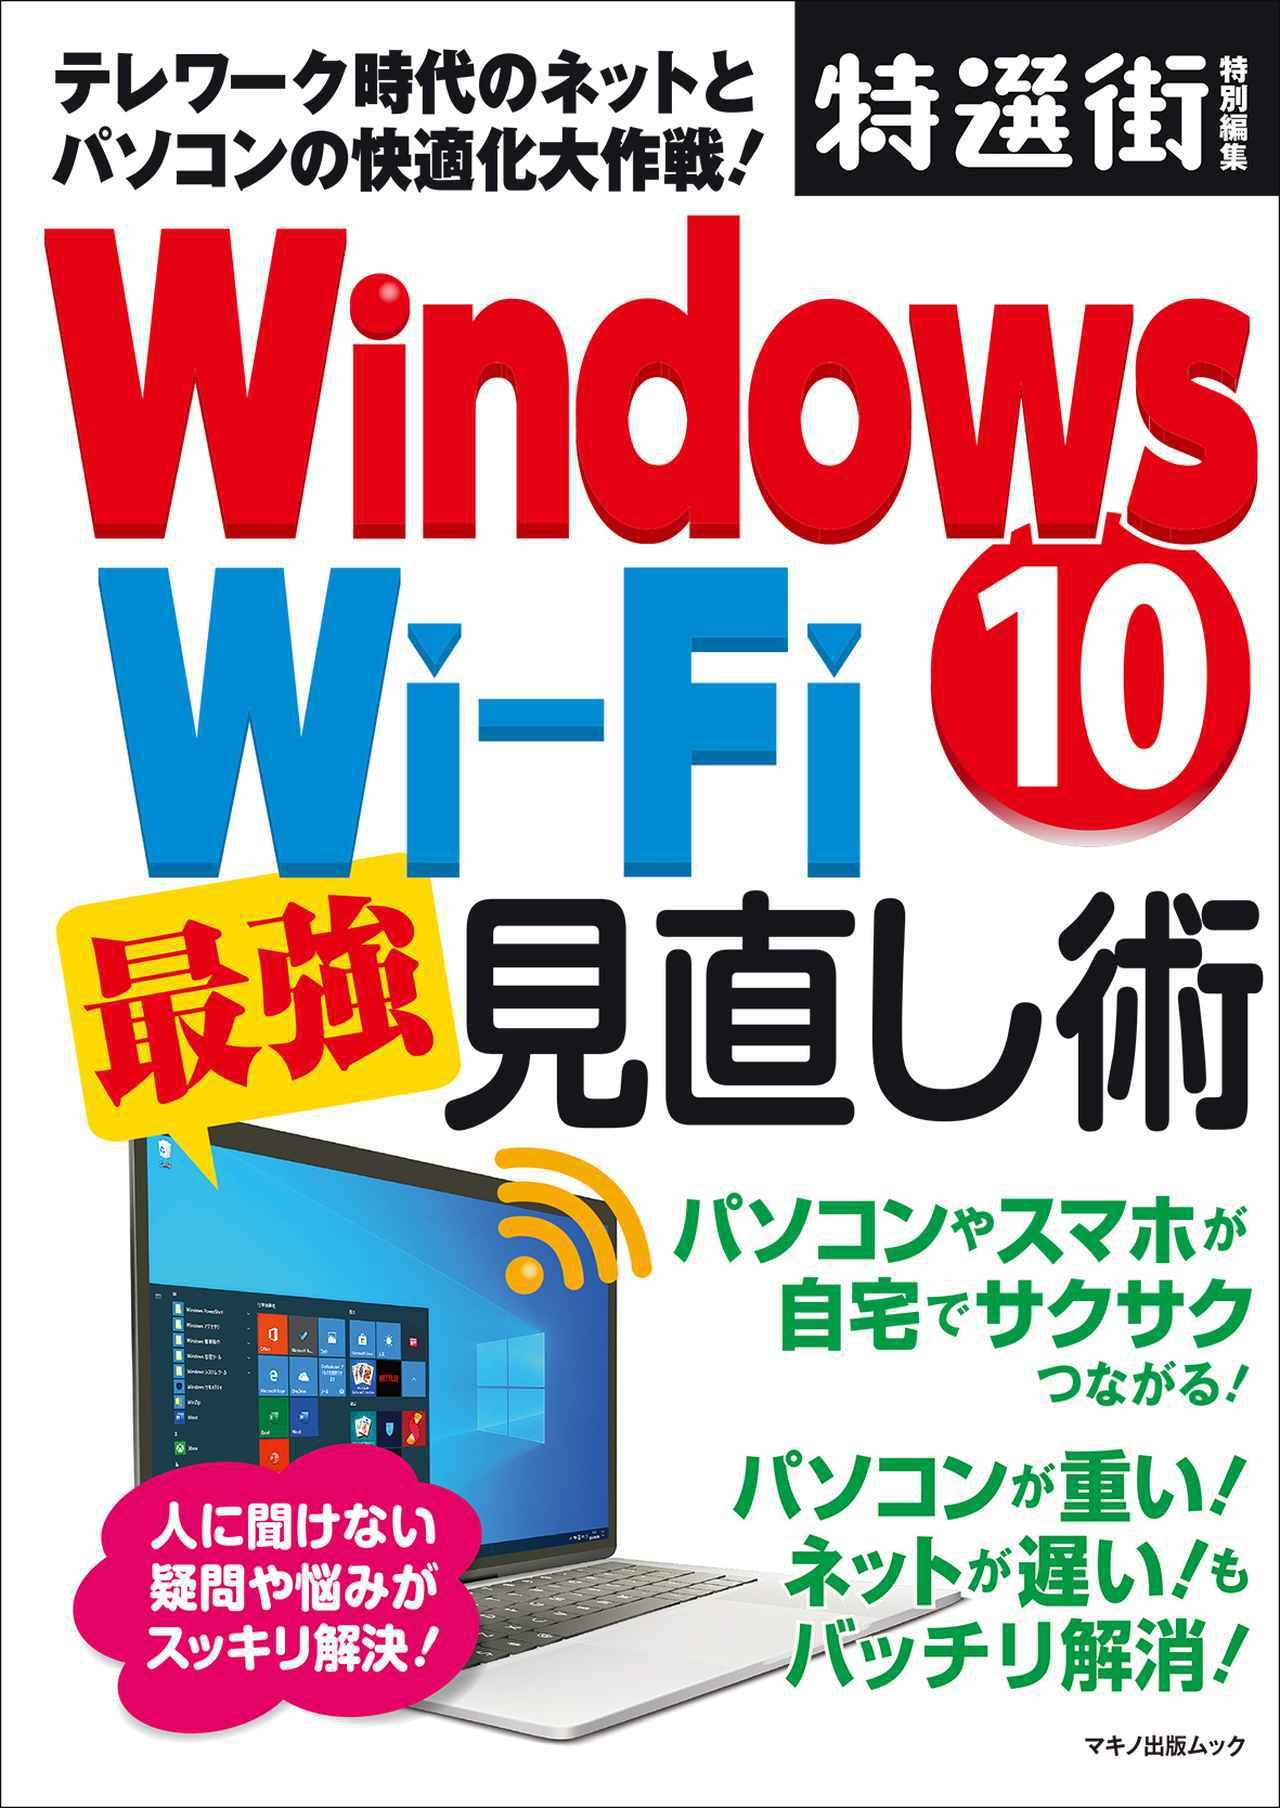 画像: 『Windows10 Wi-Fi 最強見直し術』 定価800円+税 ISBN:978-4-8376-6630-1